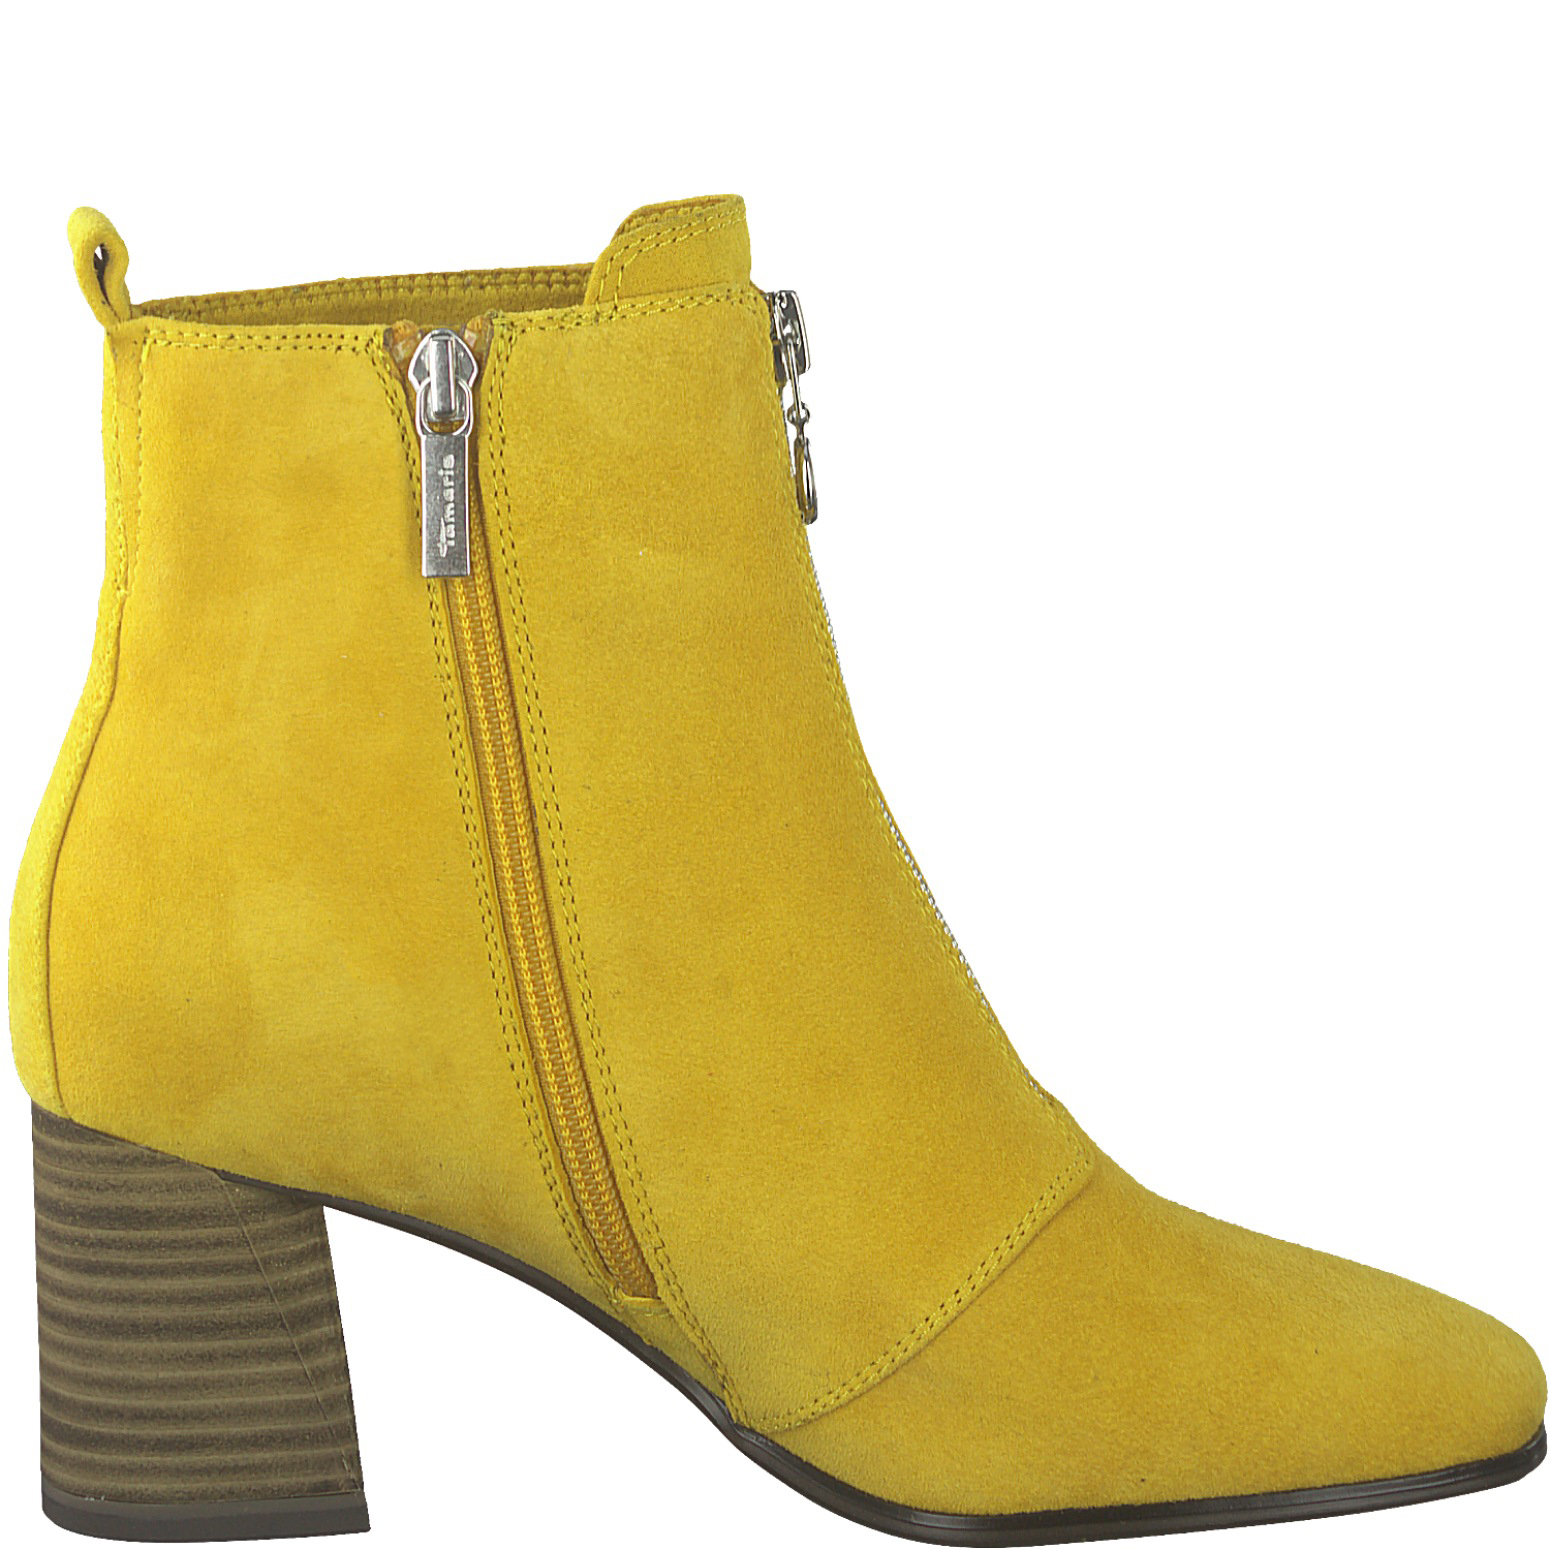 Ankle Damen 33 Stiefeletten Tamaris 25969 Boots 1 Heel High